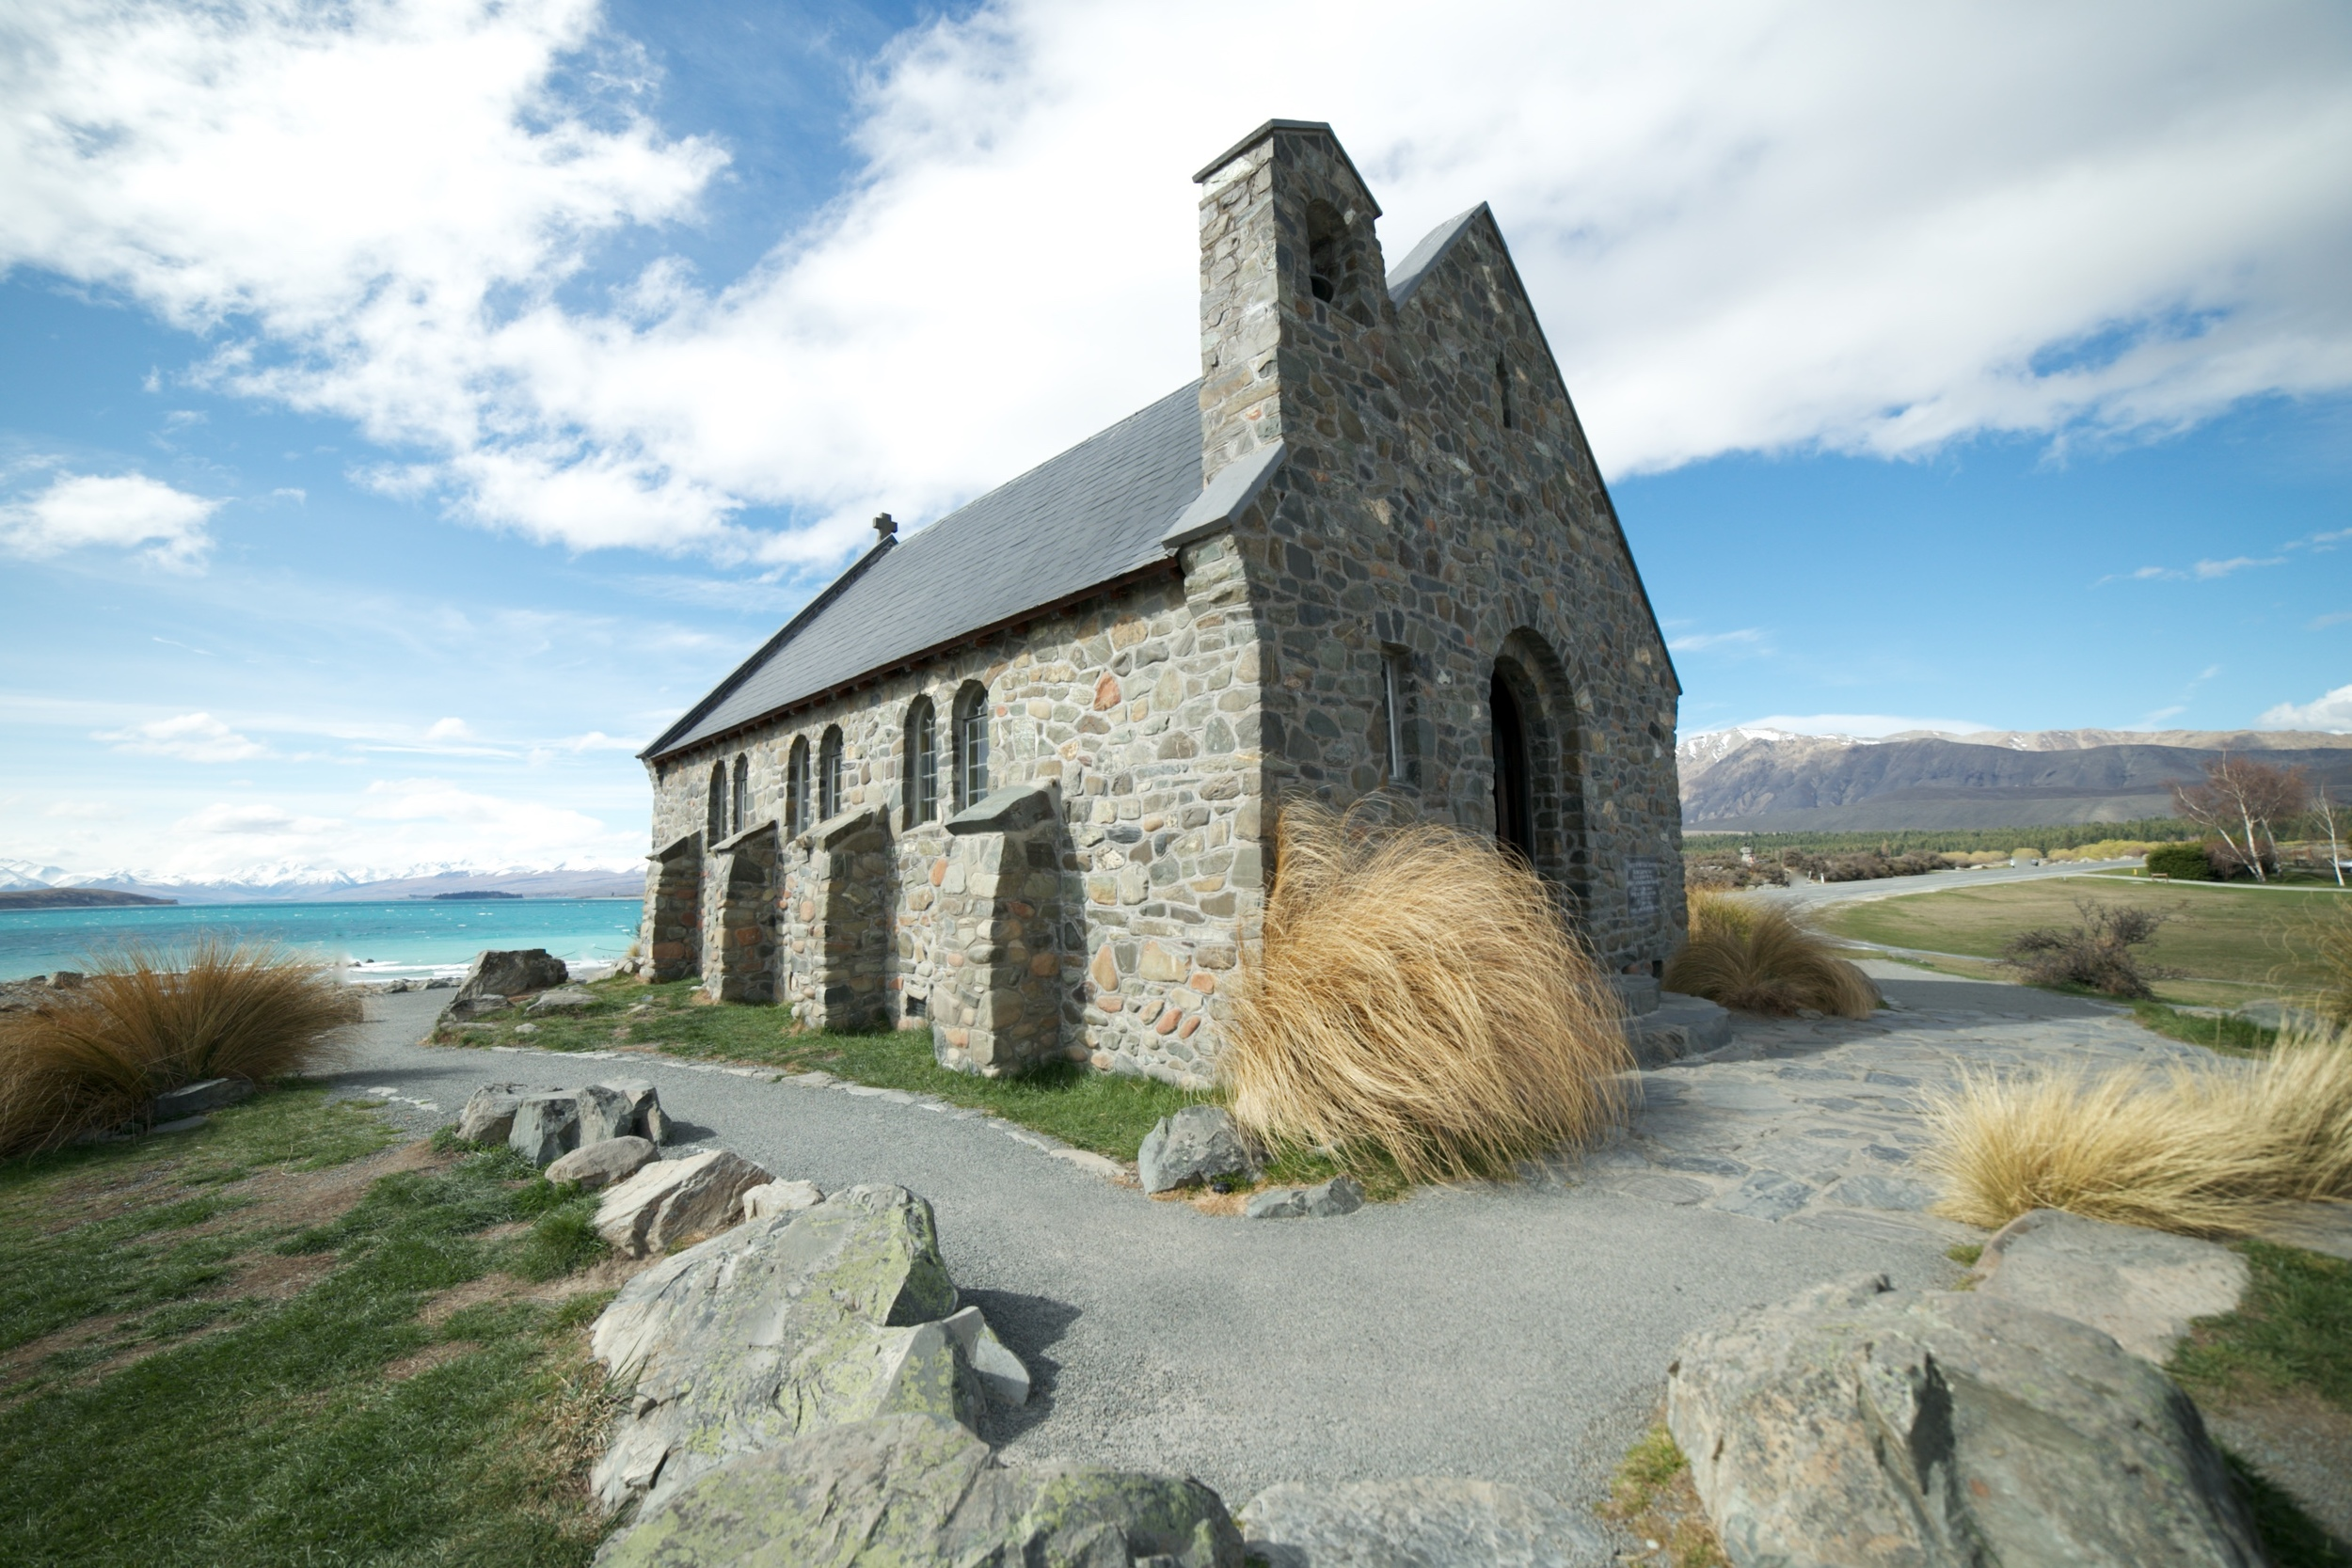 The church of the Good Shepherd by Lake Tekapo in spring daytime, New Zealand.